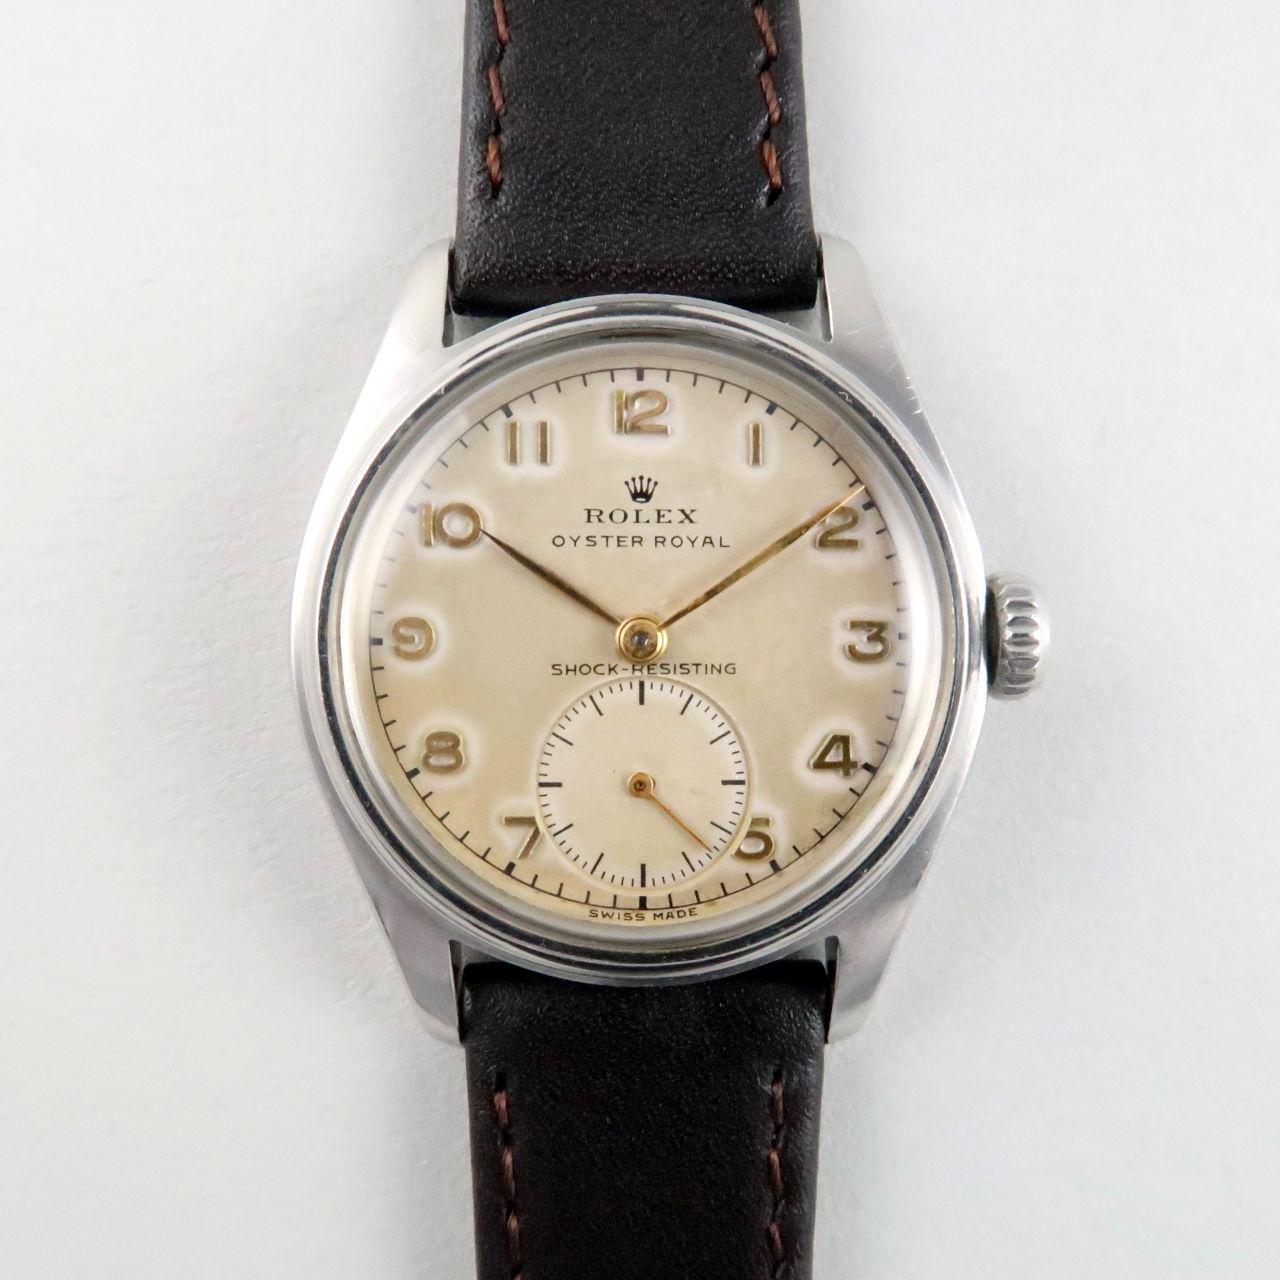 rolex-oyster-royal-ref-6044-steel-circa-1950-wxrosa-v01